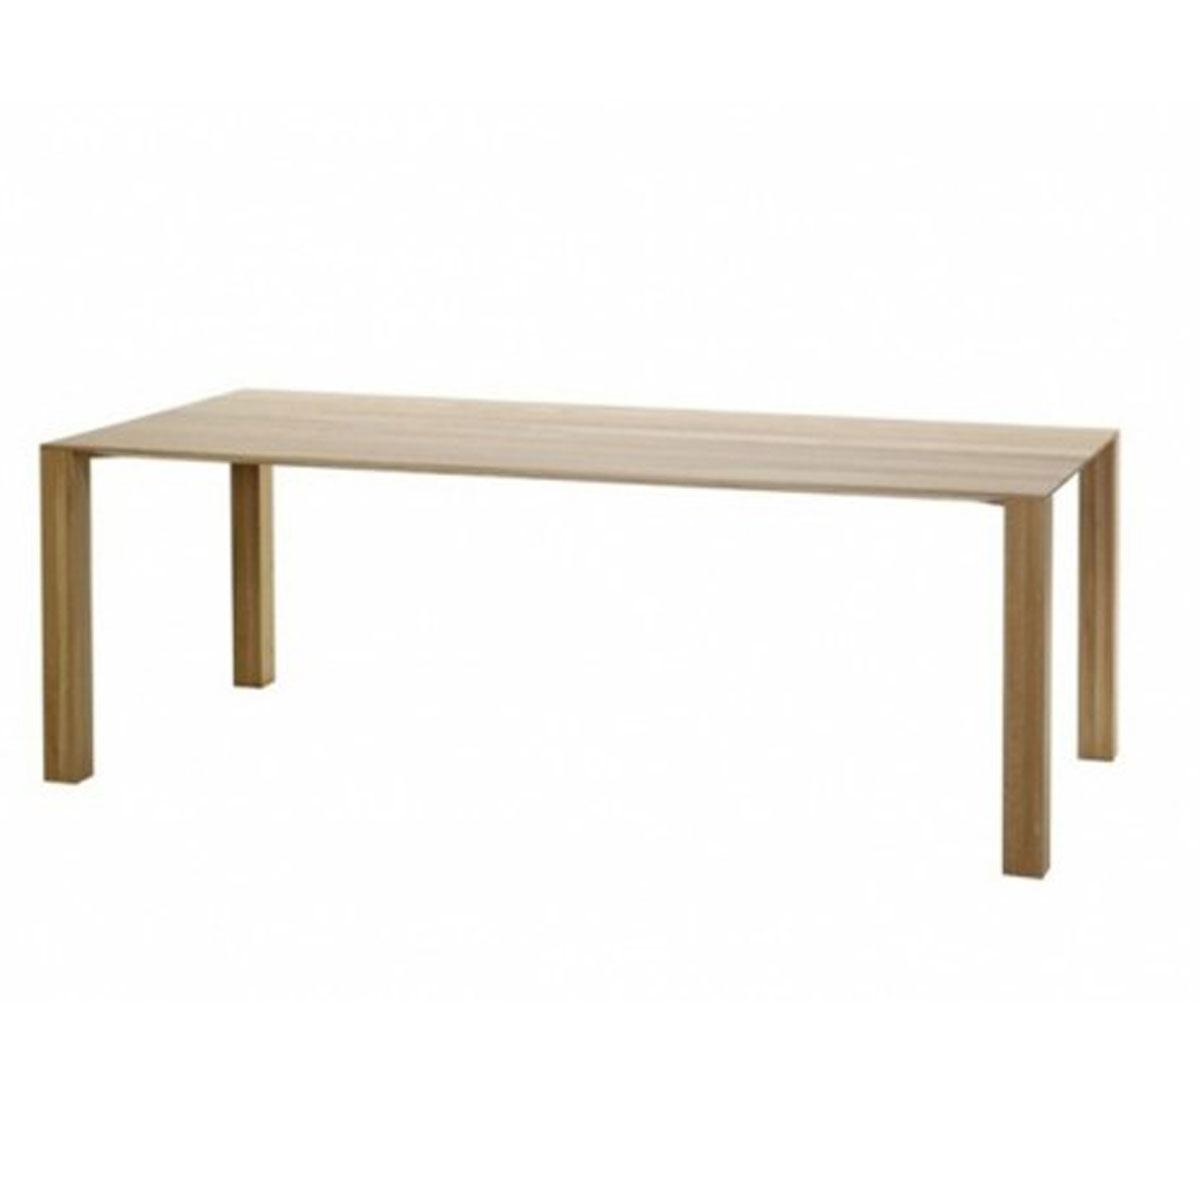 Massief eiken tafels van evolution squat tafel design for Houten eettafel design